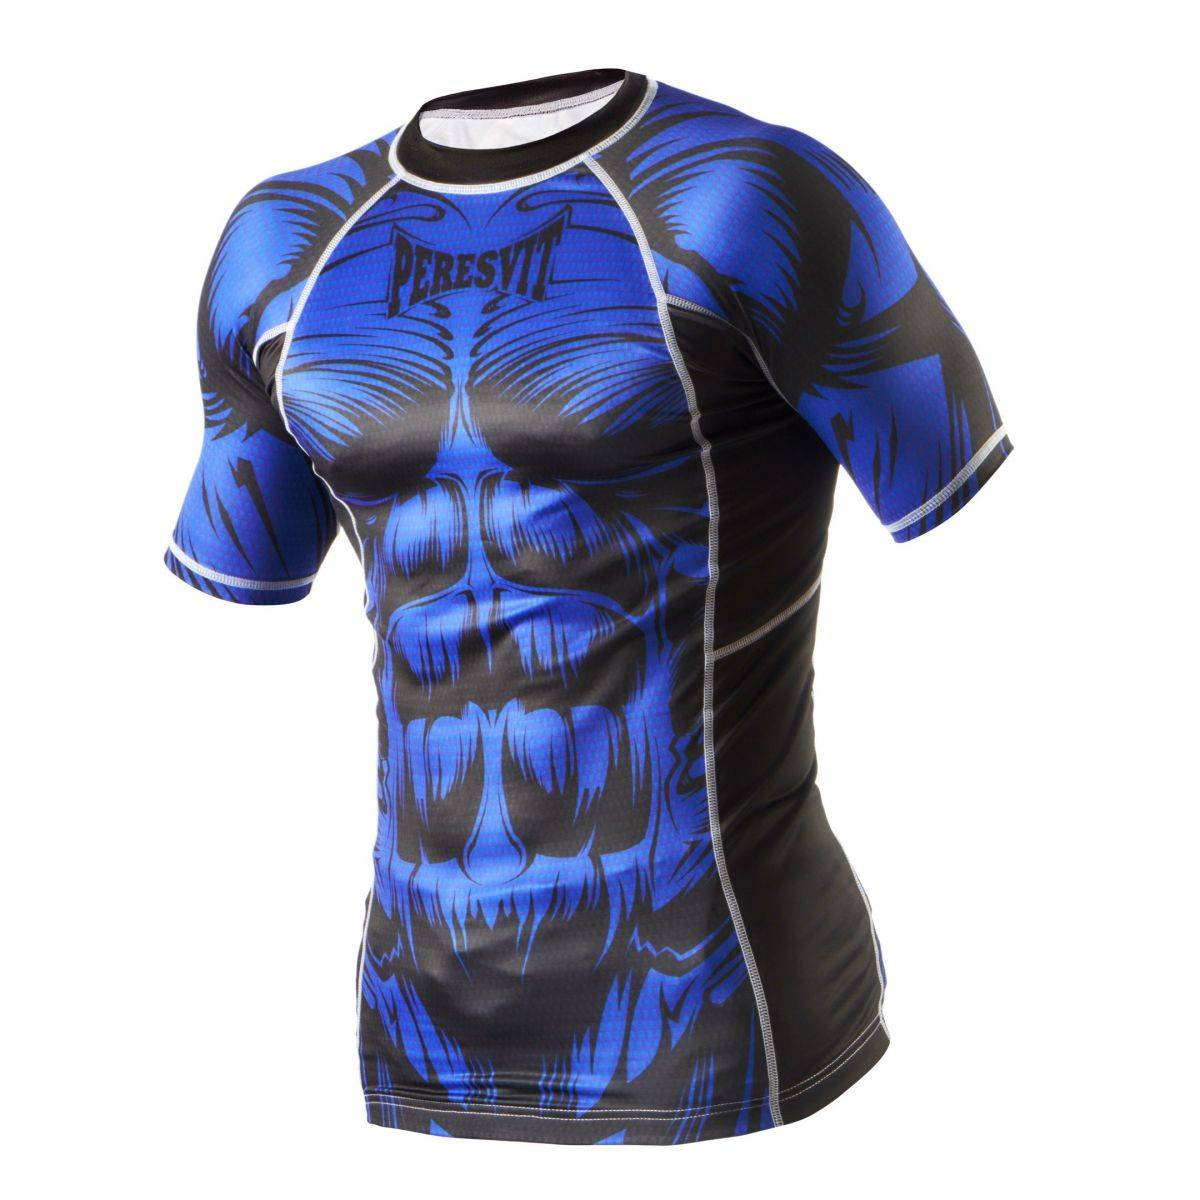 Компрессионная футболка Peresvit Beast Silver Force Blue-S